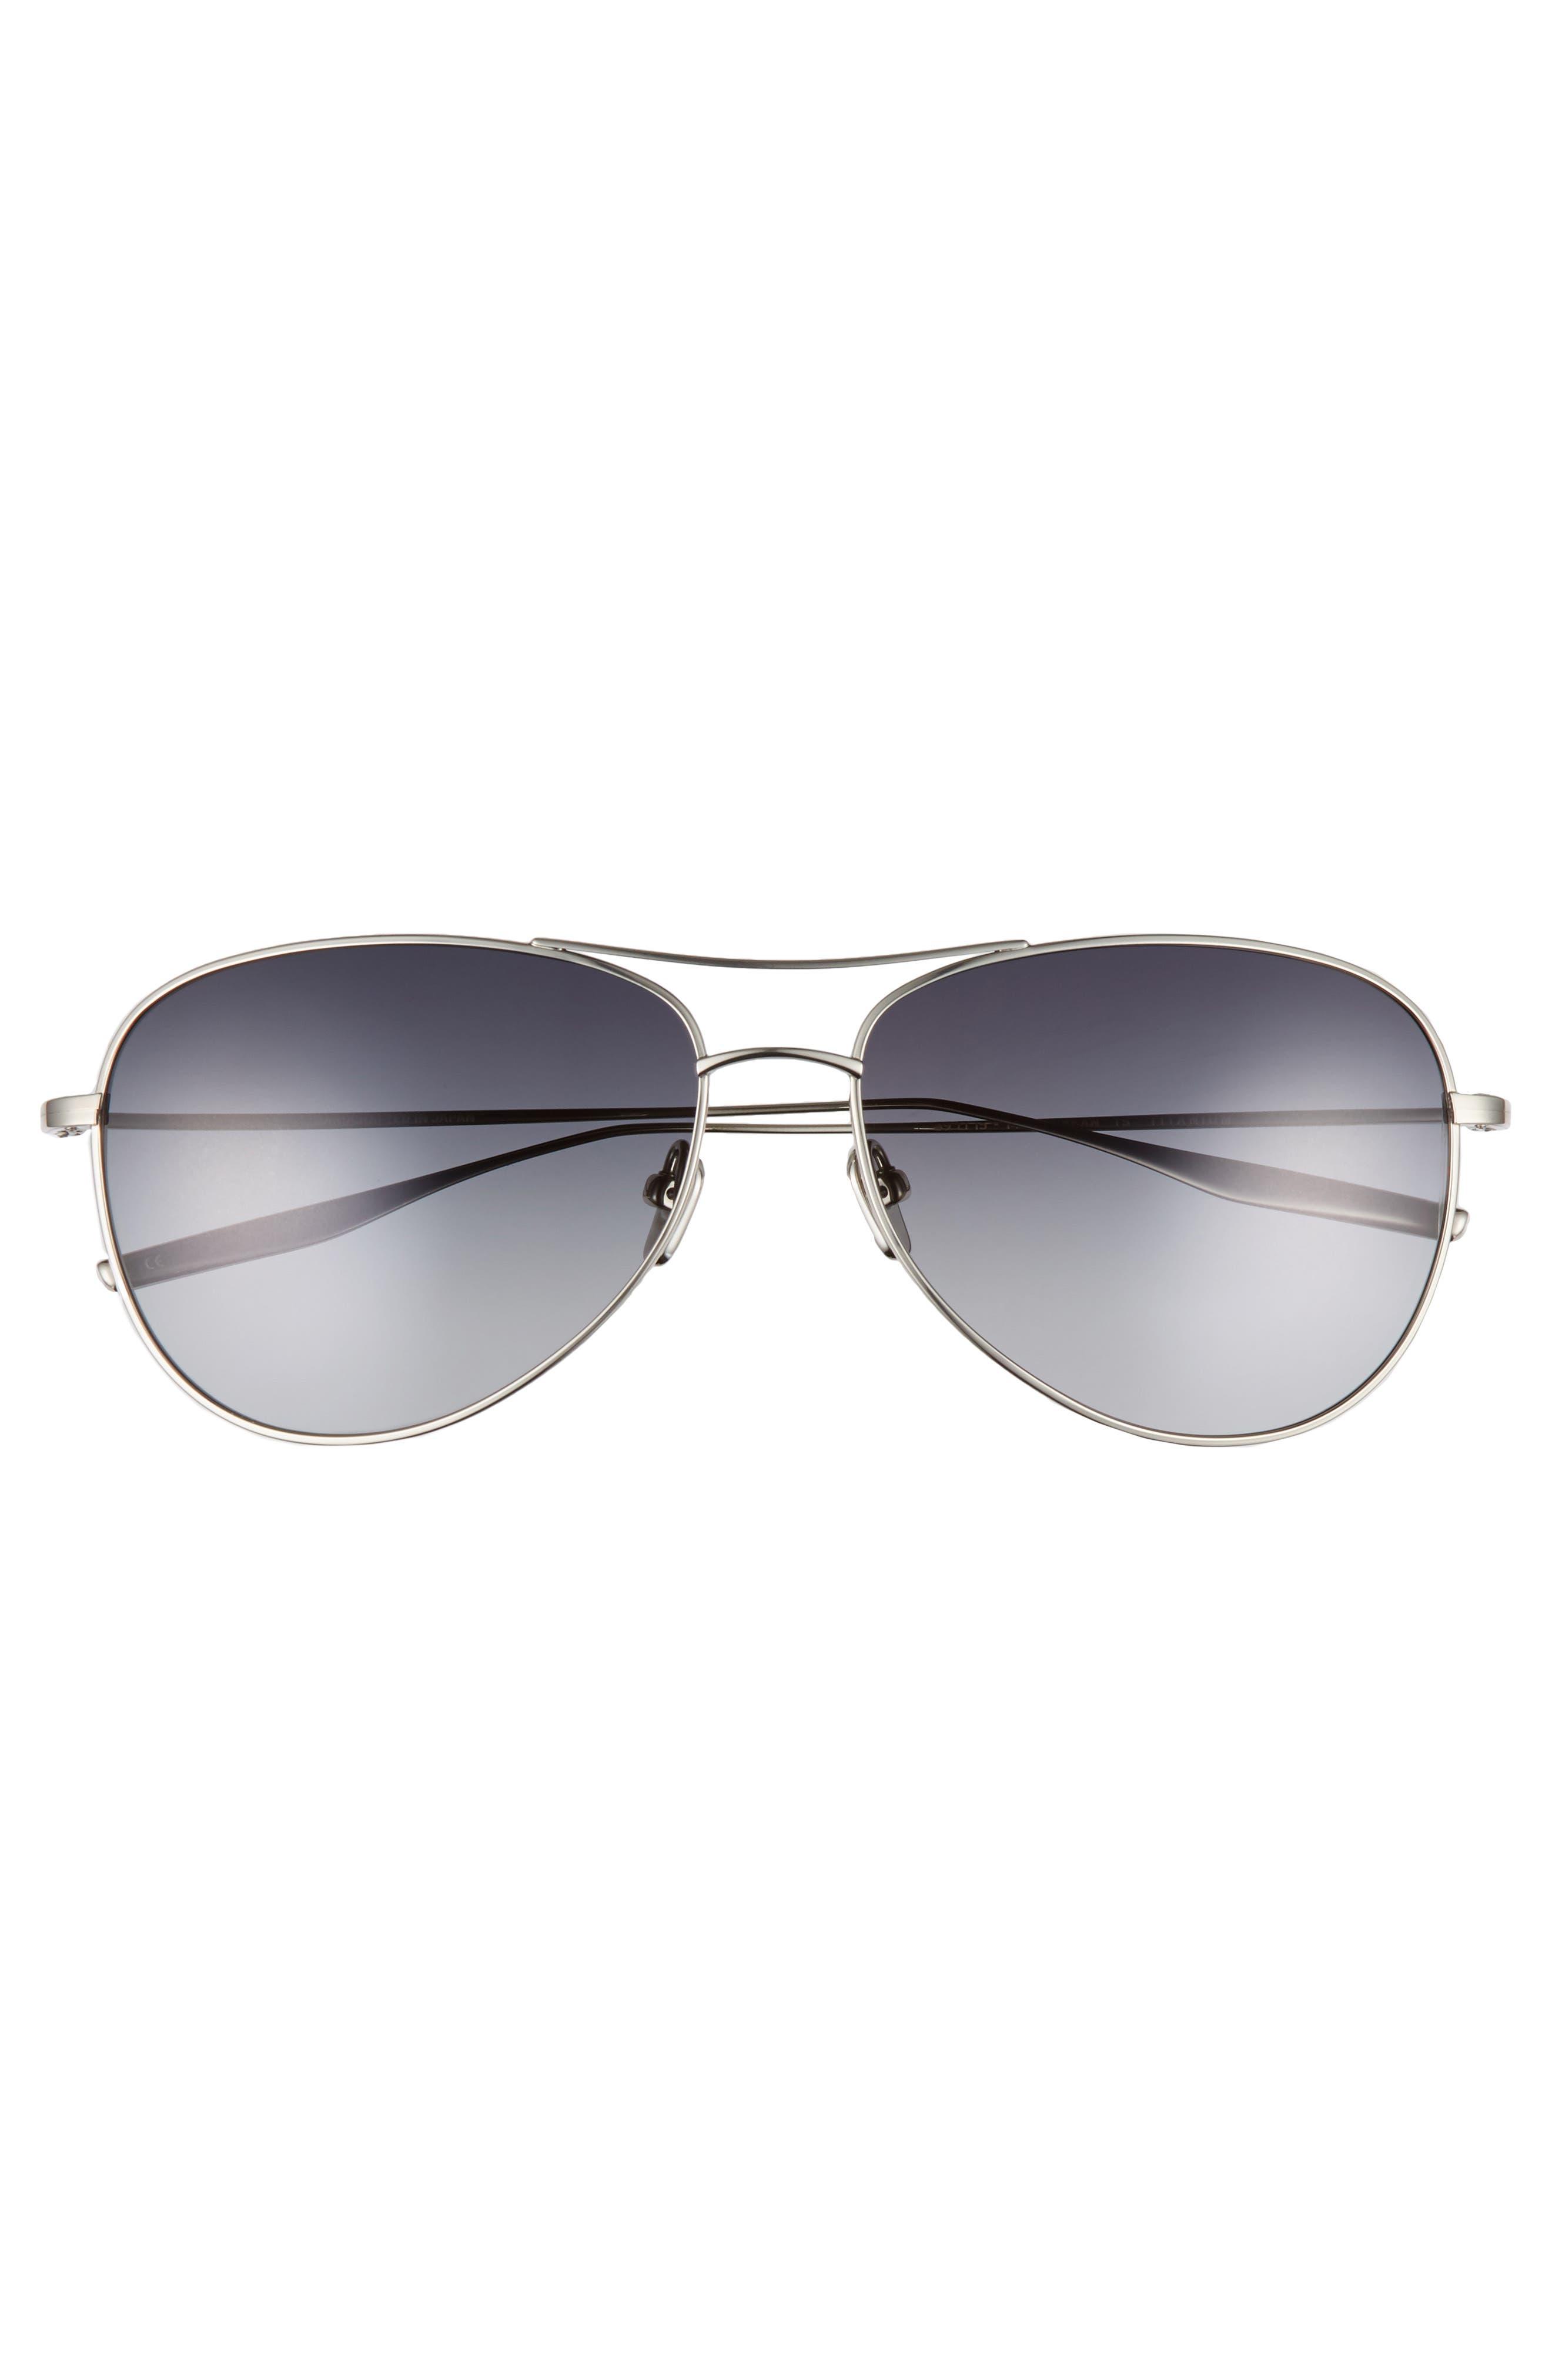 McKean 59mm Aviator Sunglasses,                             Alternate thumbnail 2, color,                             TRADITIONAL SILVER